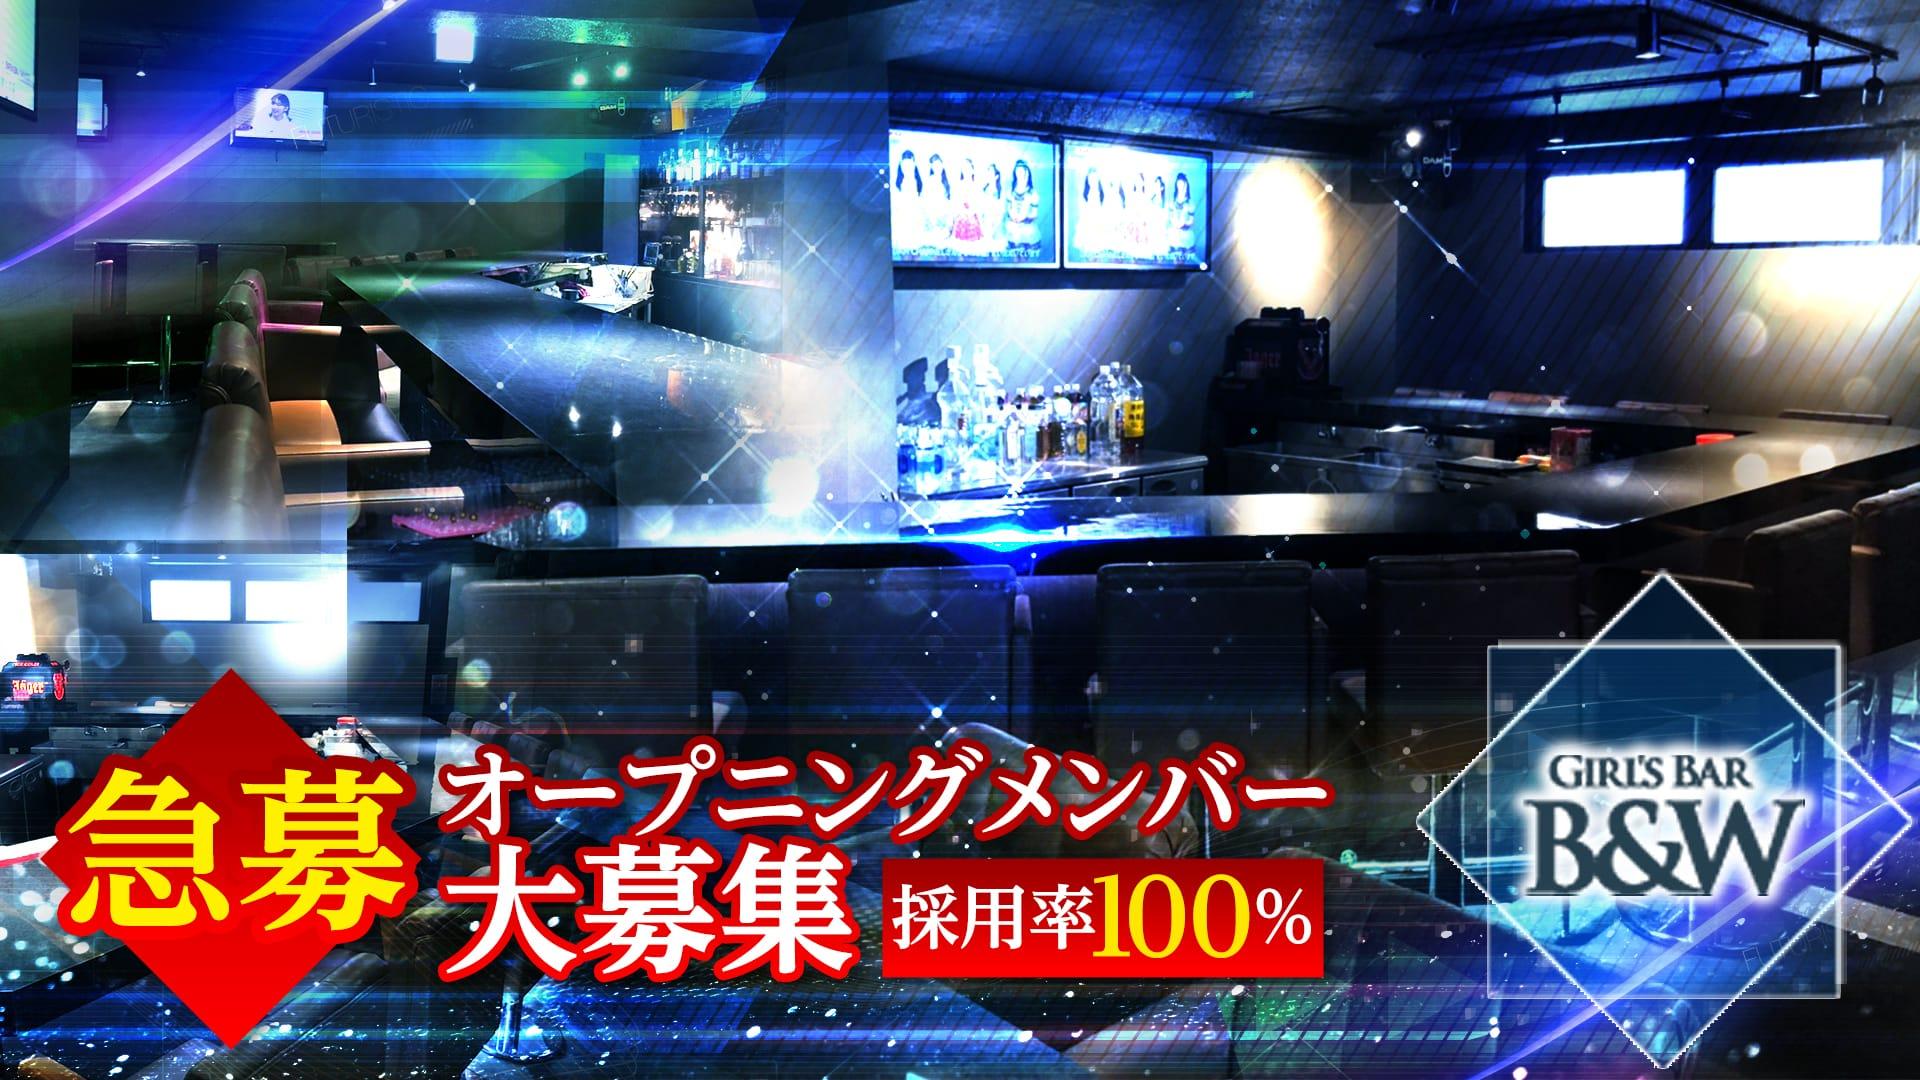 B&W 錦糸町店<ビーアンドダブリュー> 錦糸町 ガールズバー TOP画像